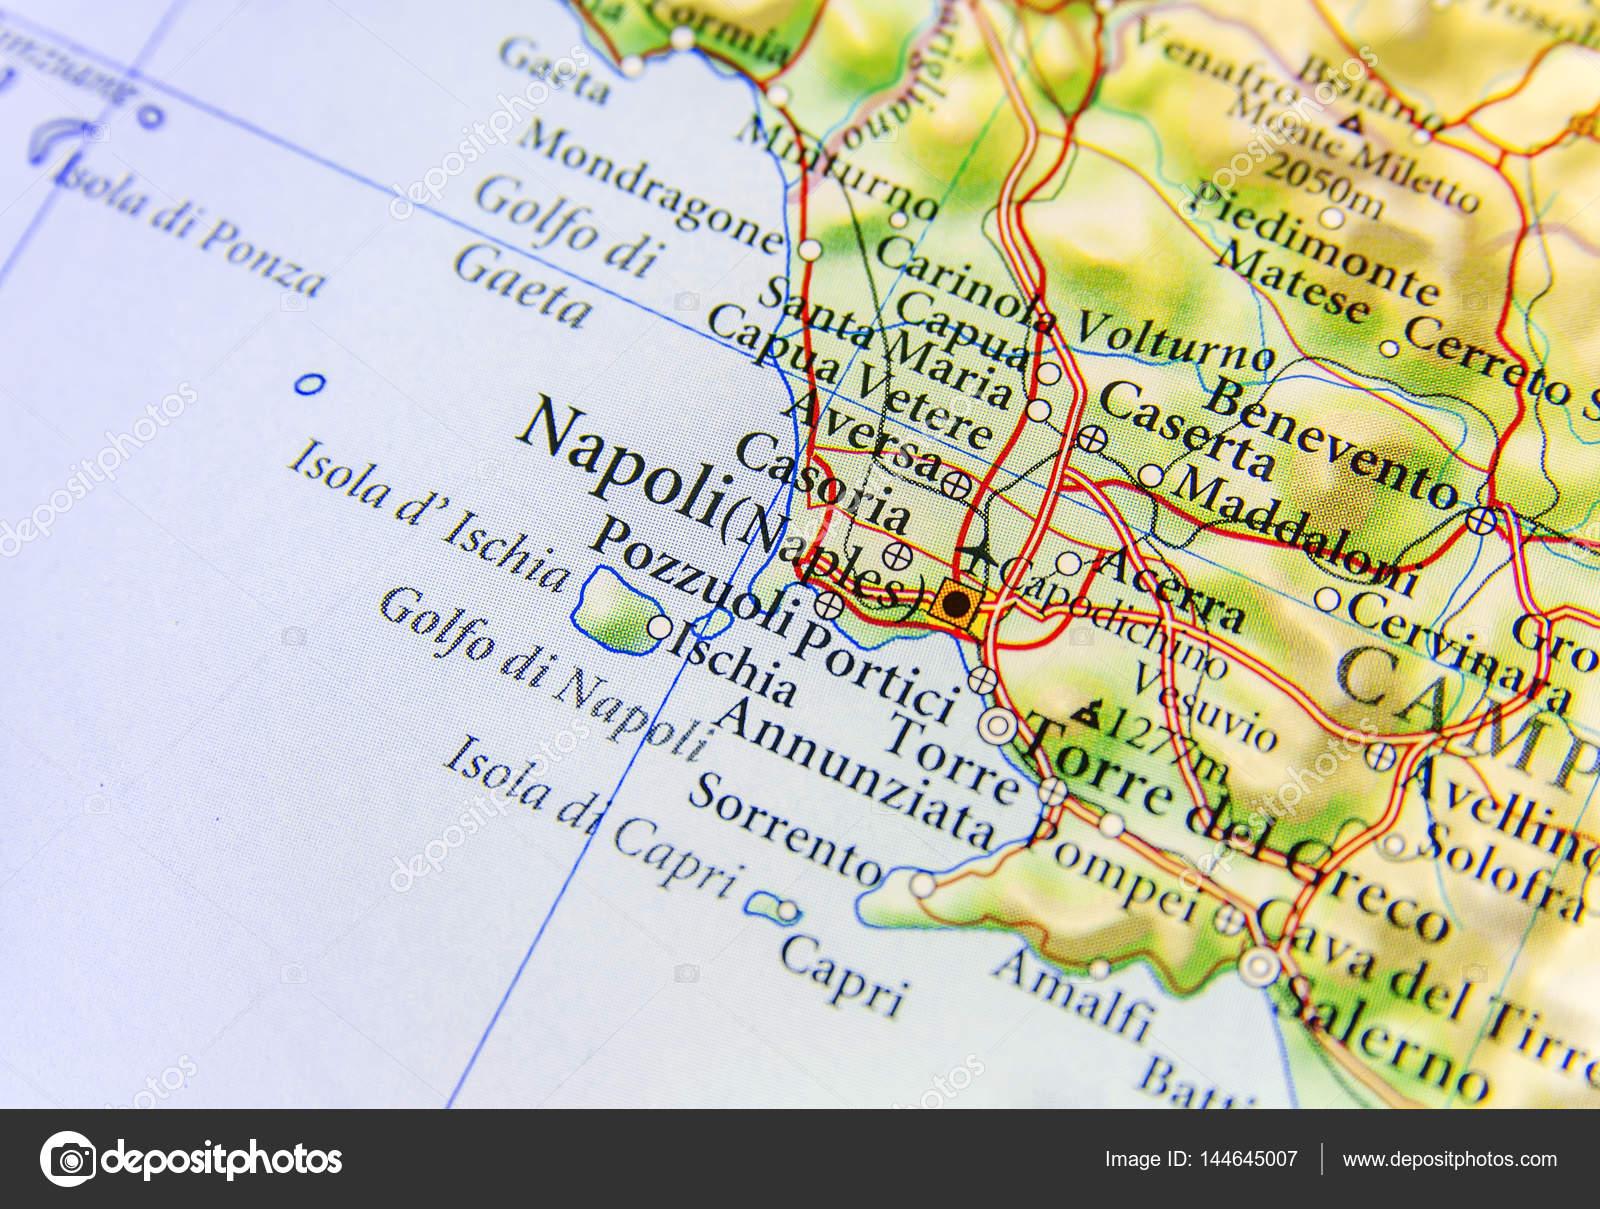 Cartina Geografica Napoli E Dintorni.Napoli Italia Cartina